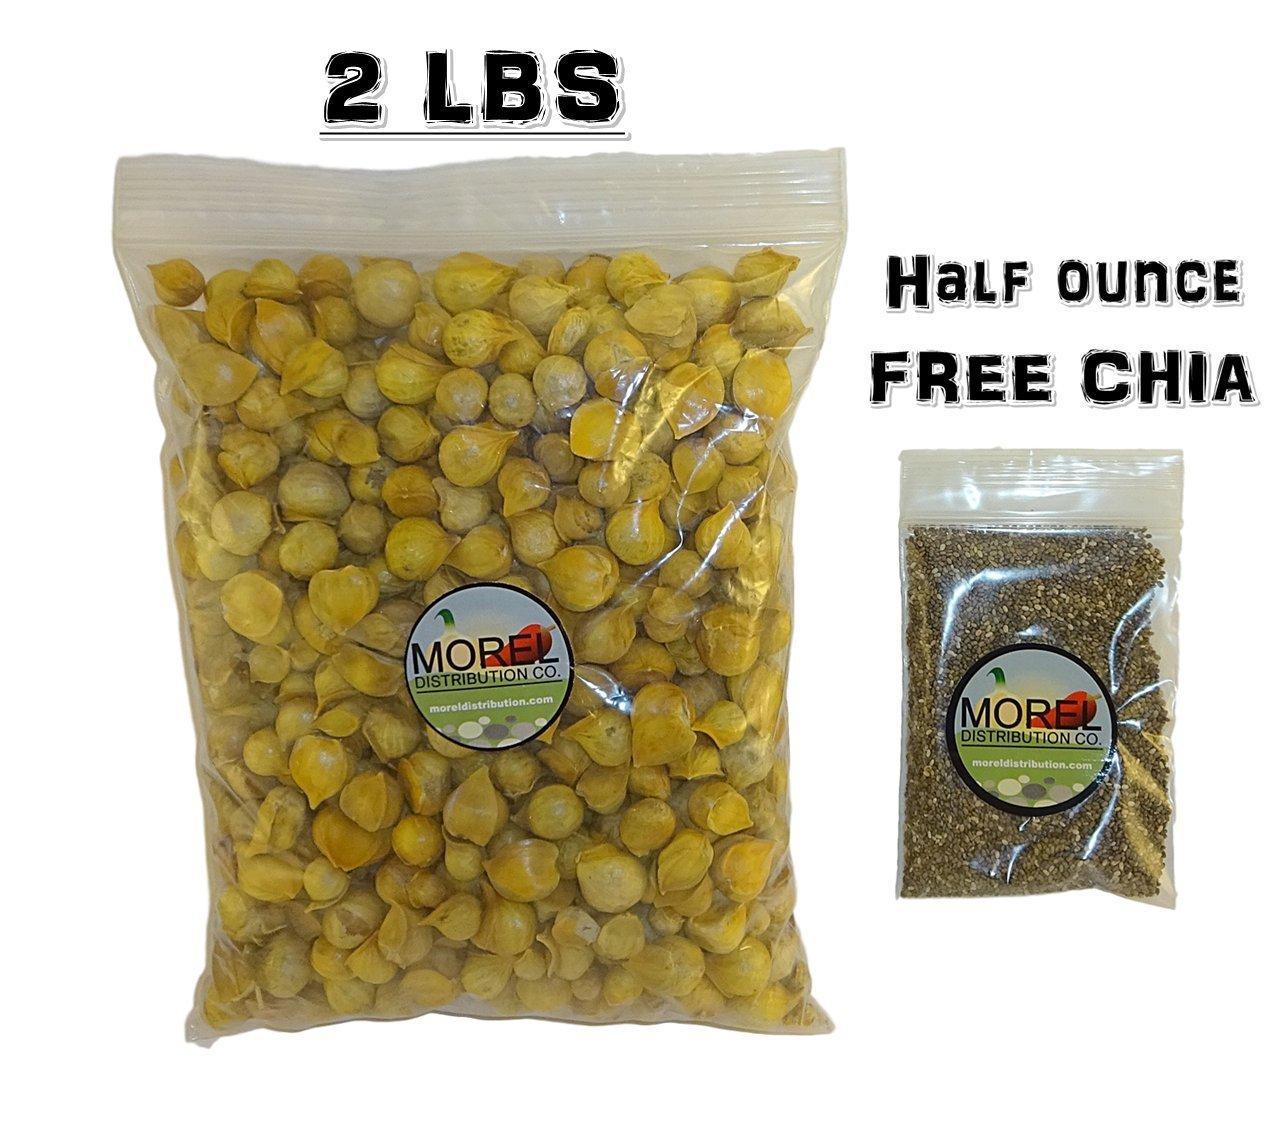 Buy Japanese Garlic (Ajo Japones) 2Lbs! and get FREE 1 oz Chia Bag! by Morel Distribution Company